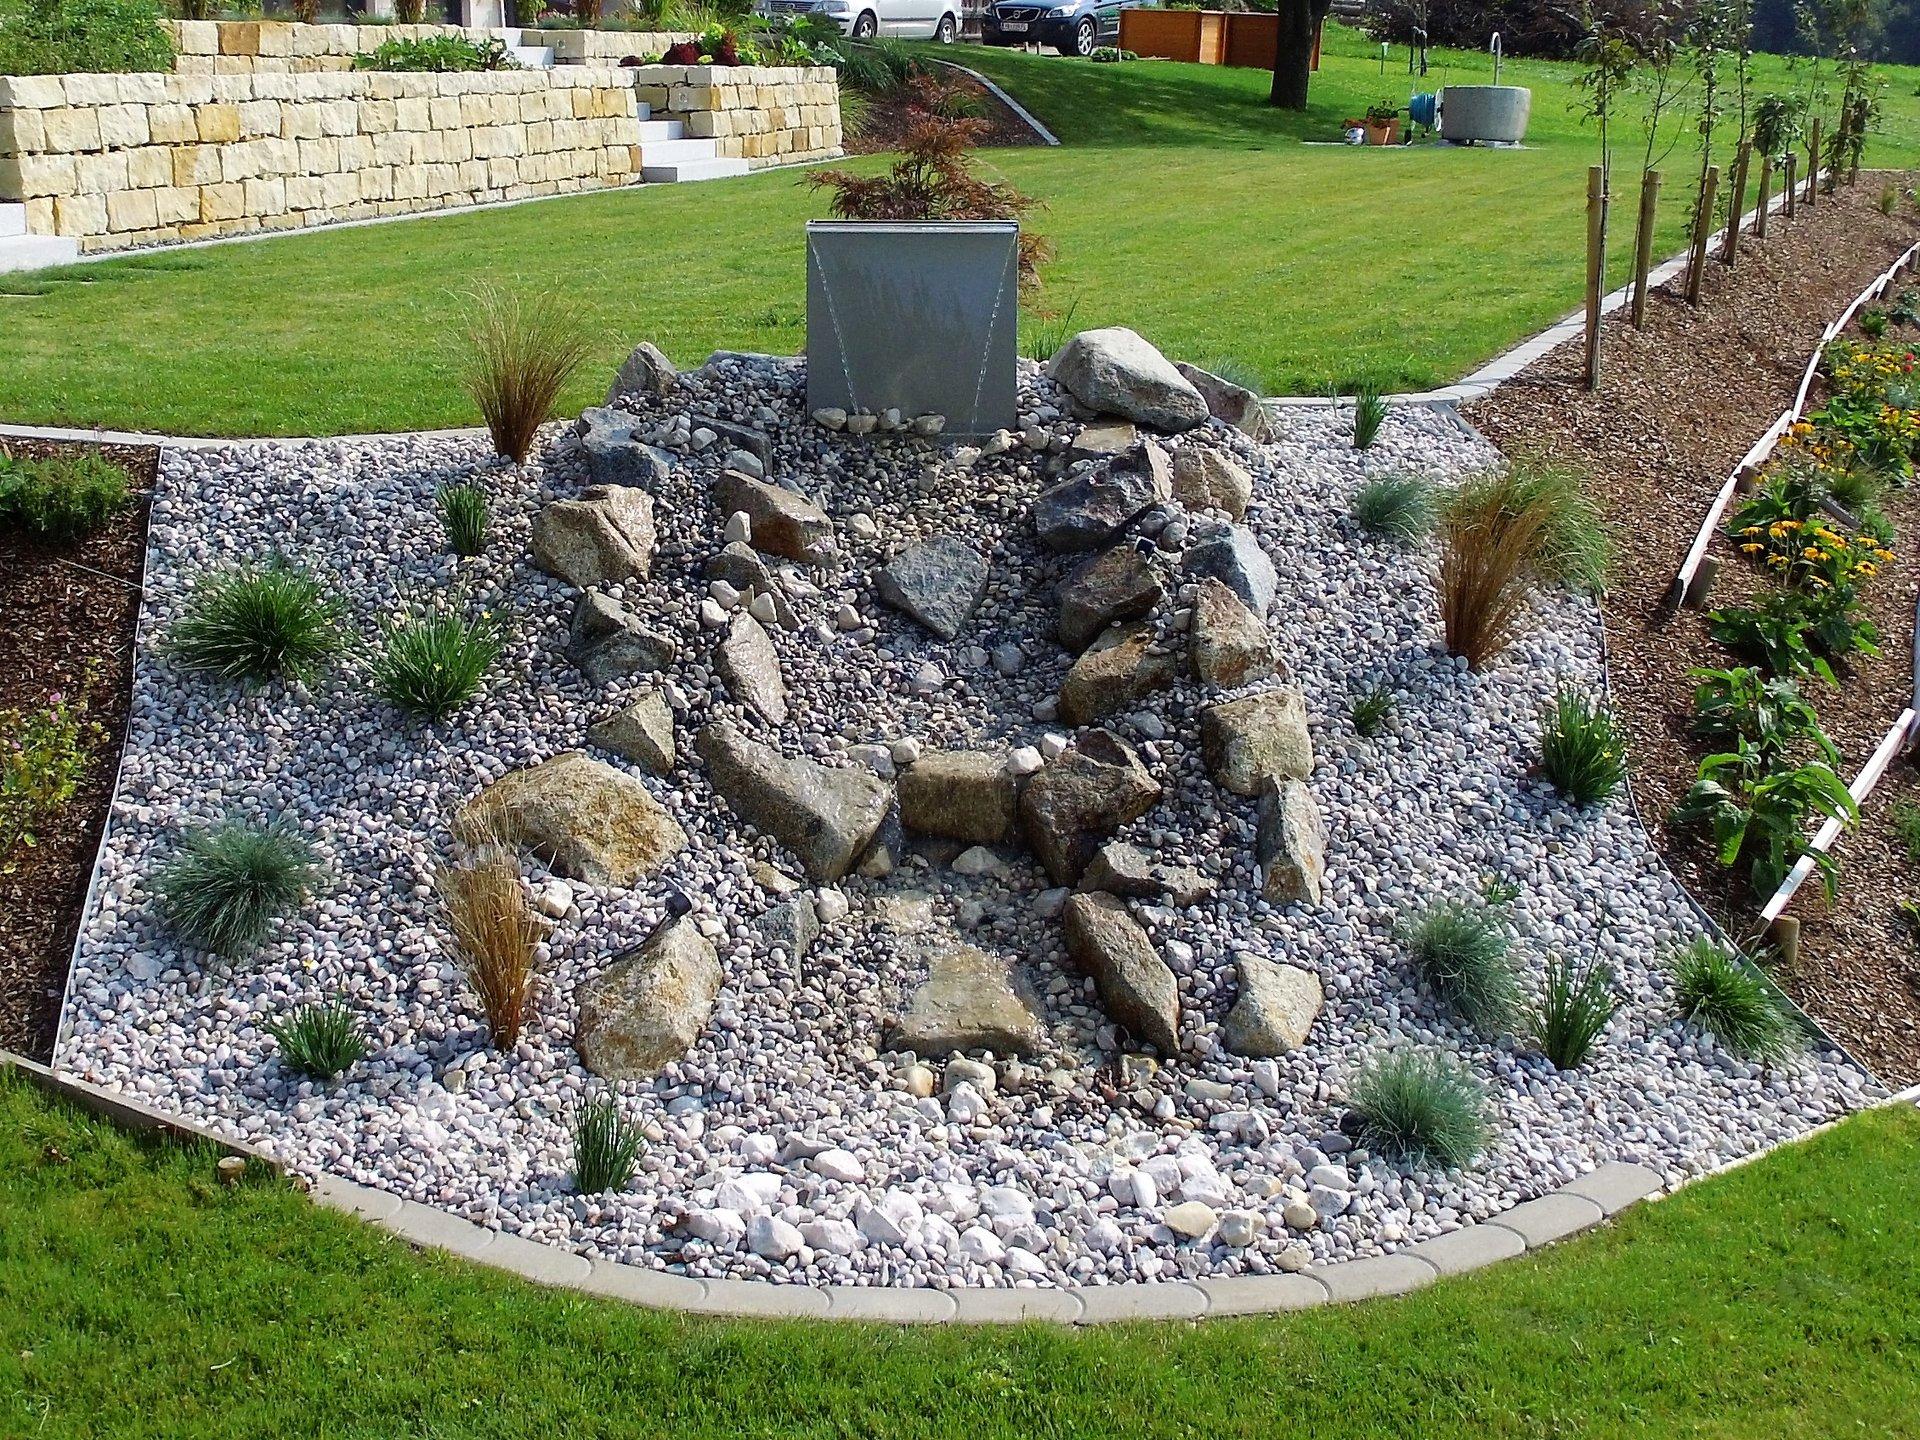 Jardin Design | Vöcklamarkt | Teichgestaltung